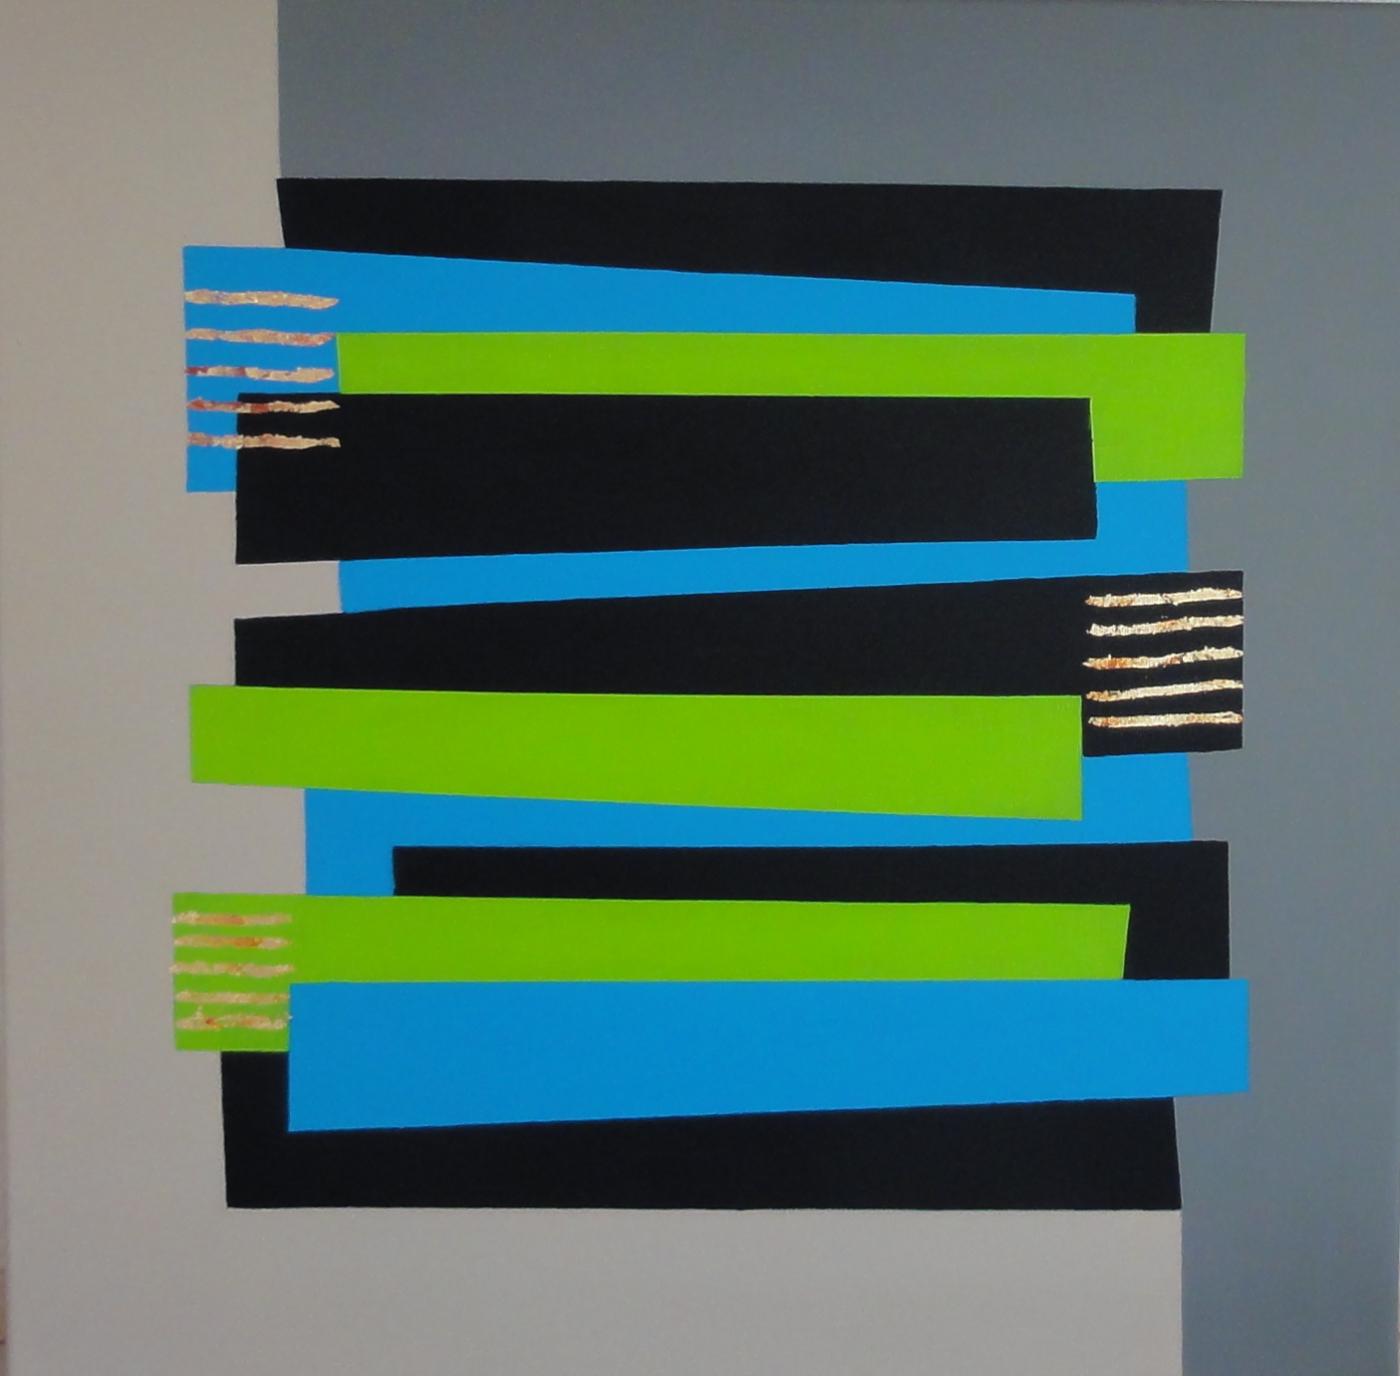 Constructive Art  - grøn blå stave   Maleri